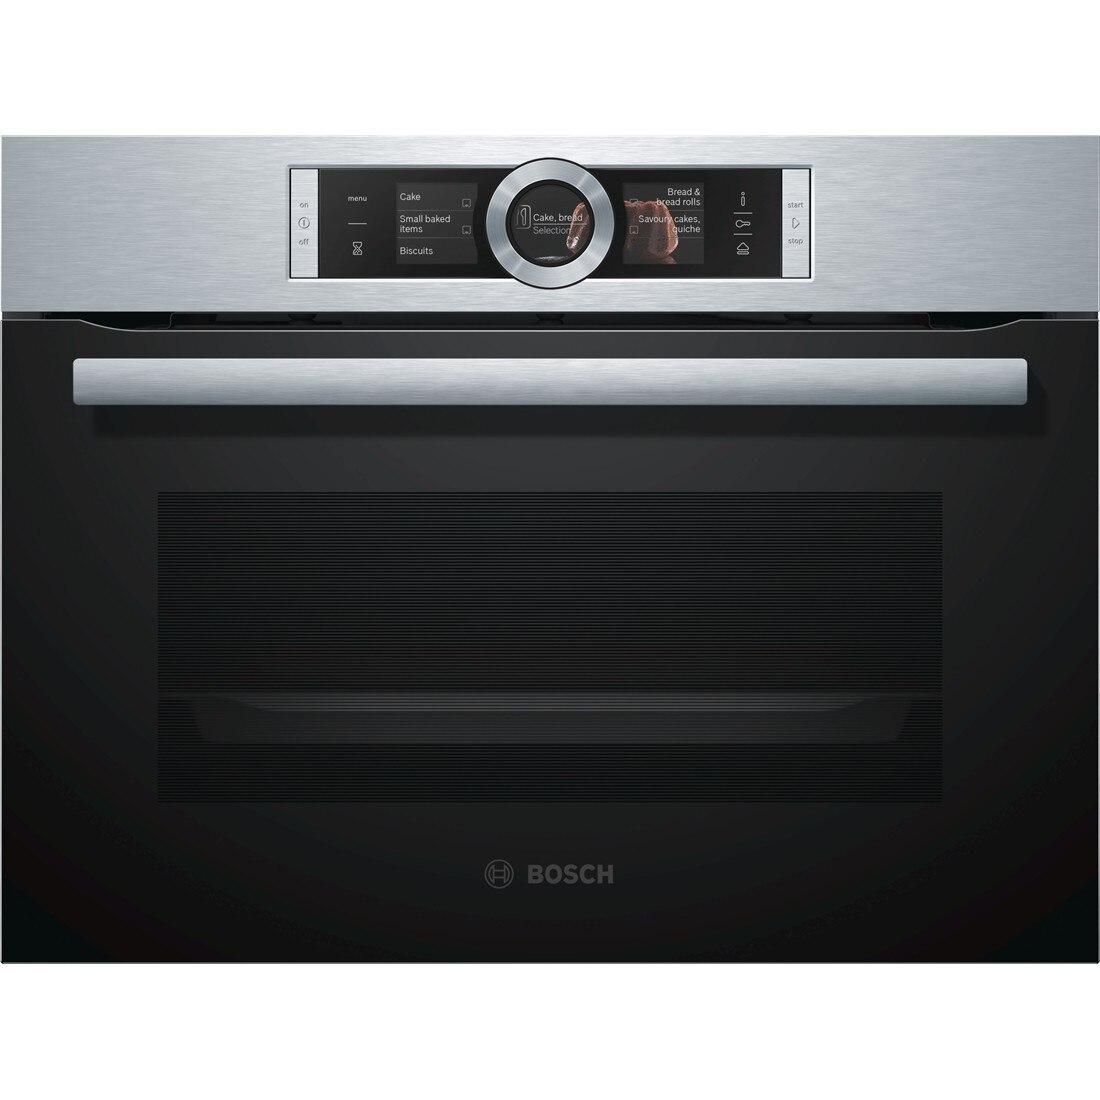 Fotografie Cuptor incorporabil Bosch CSG656BS1, Multifunctional cu aburi, 12 functii, 47 l, Inox